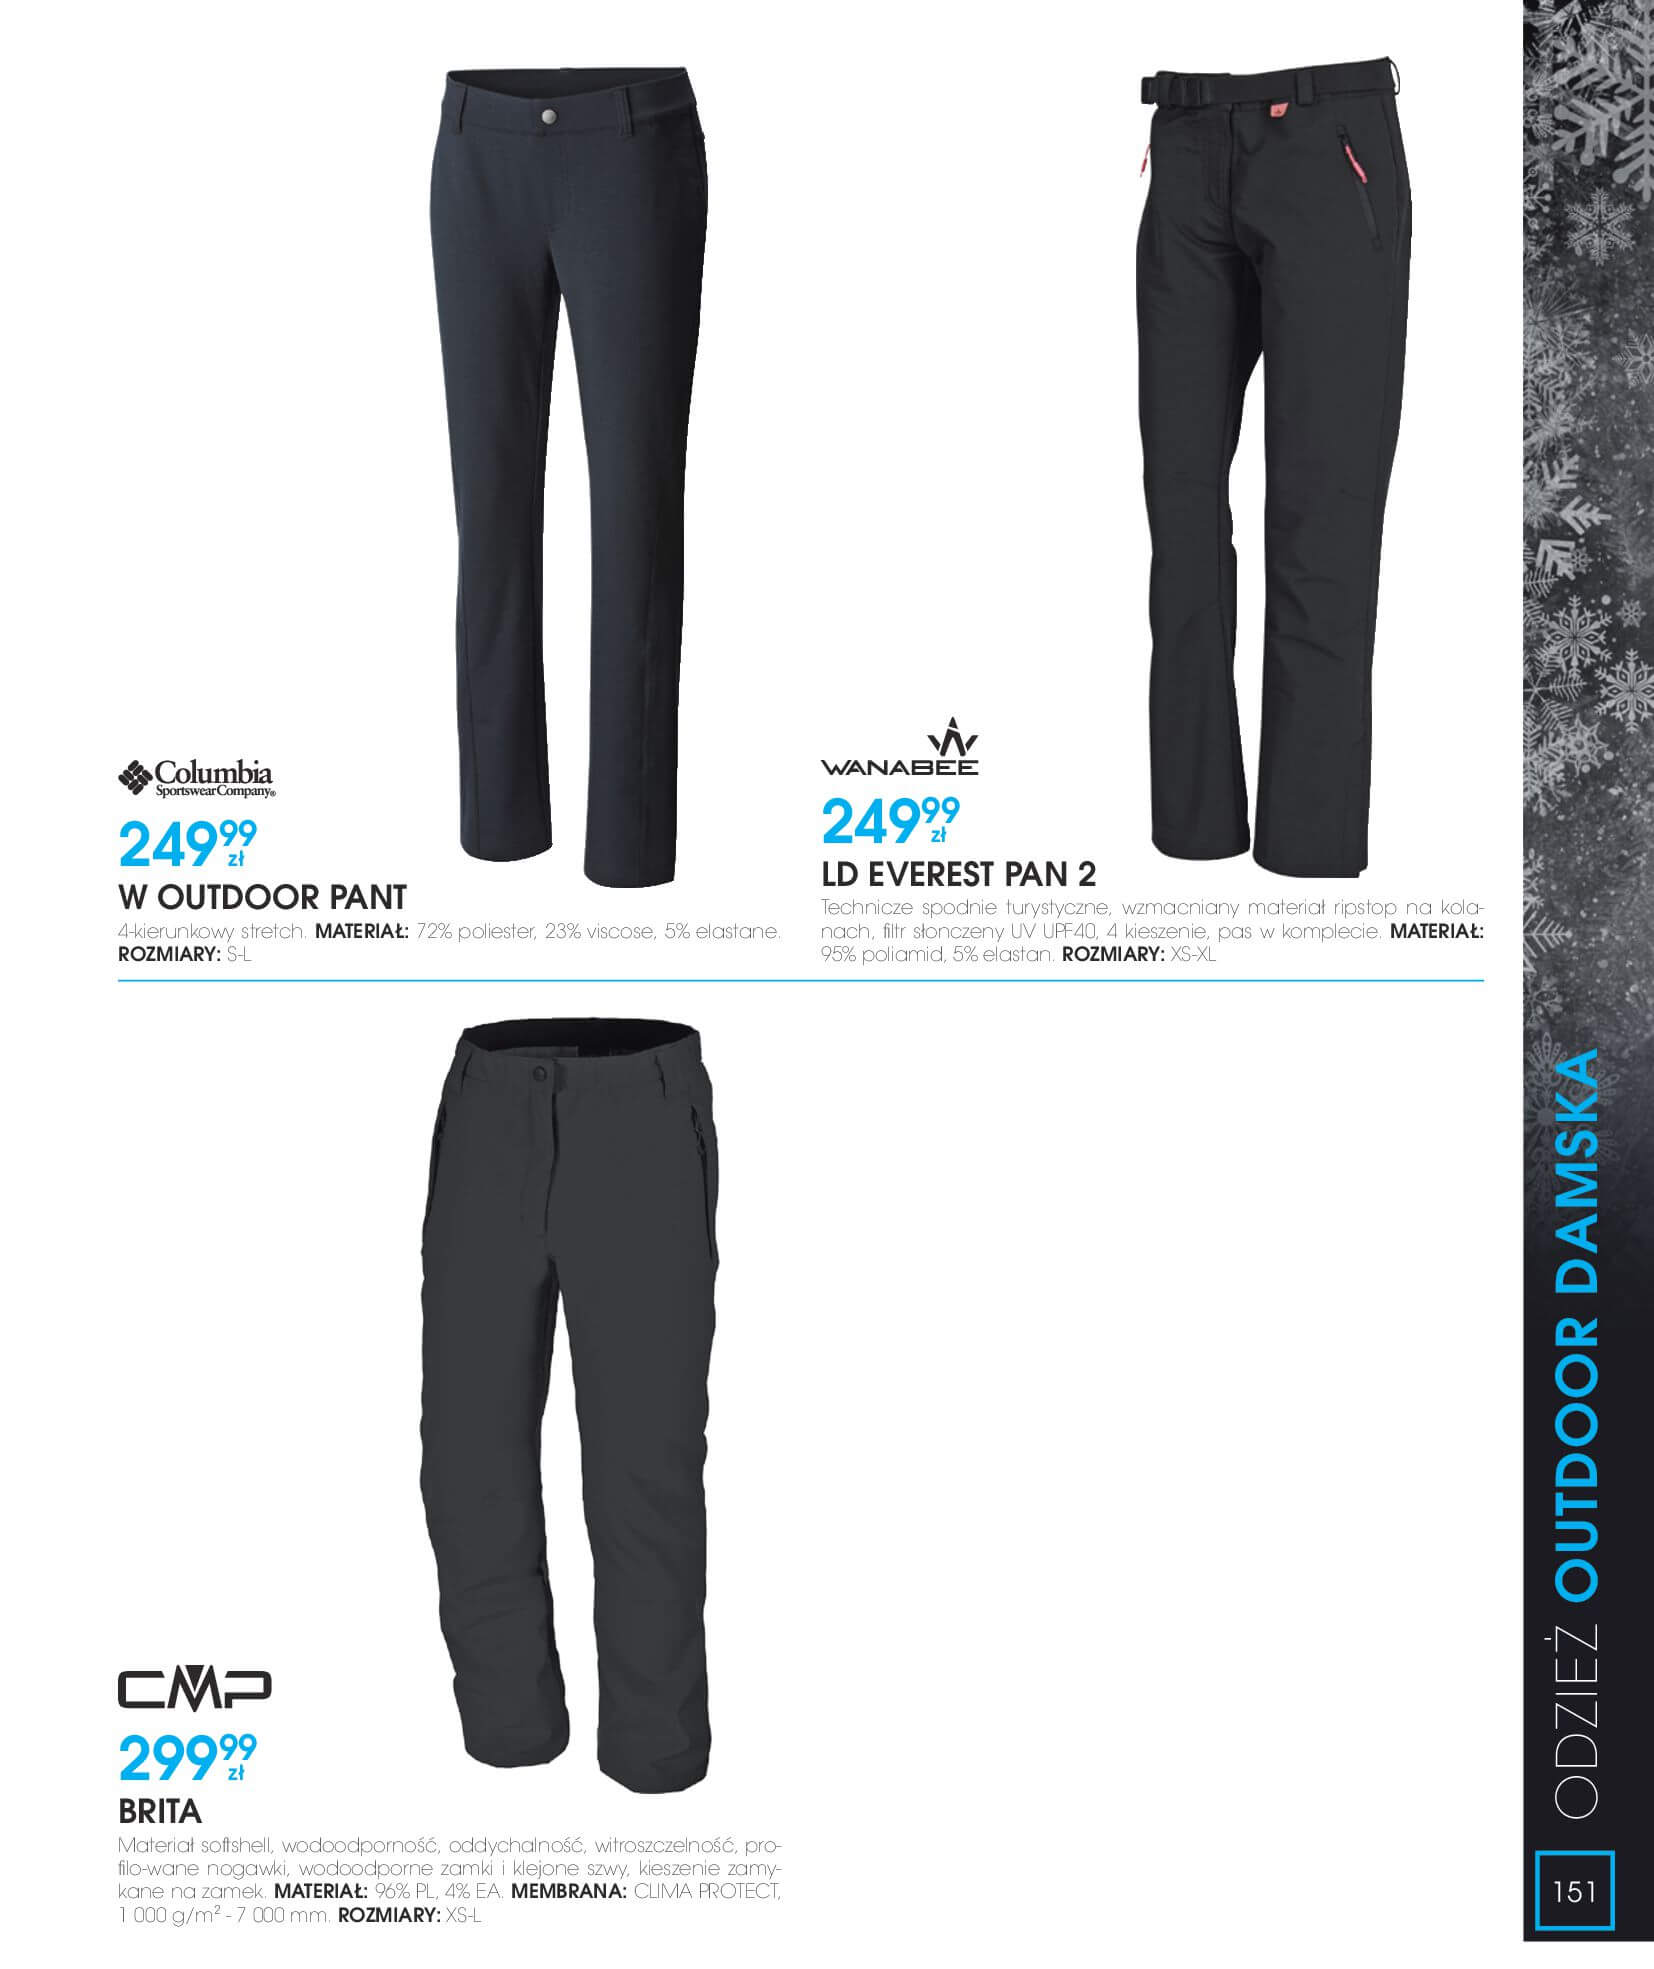 Gazetka Go Sport - Katalog Zima 2017/2018-12.11.2017-28.02.2018-page-151